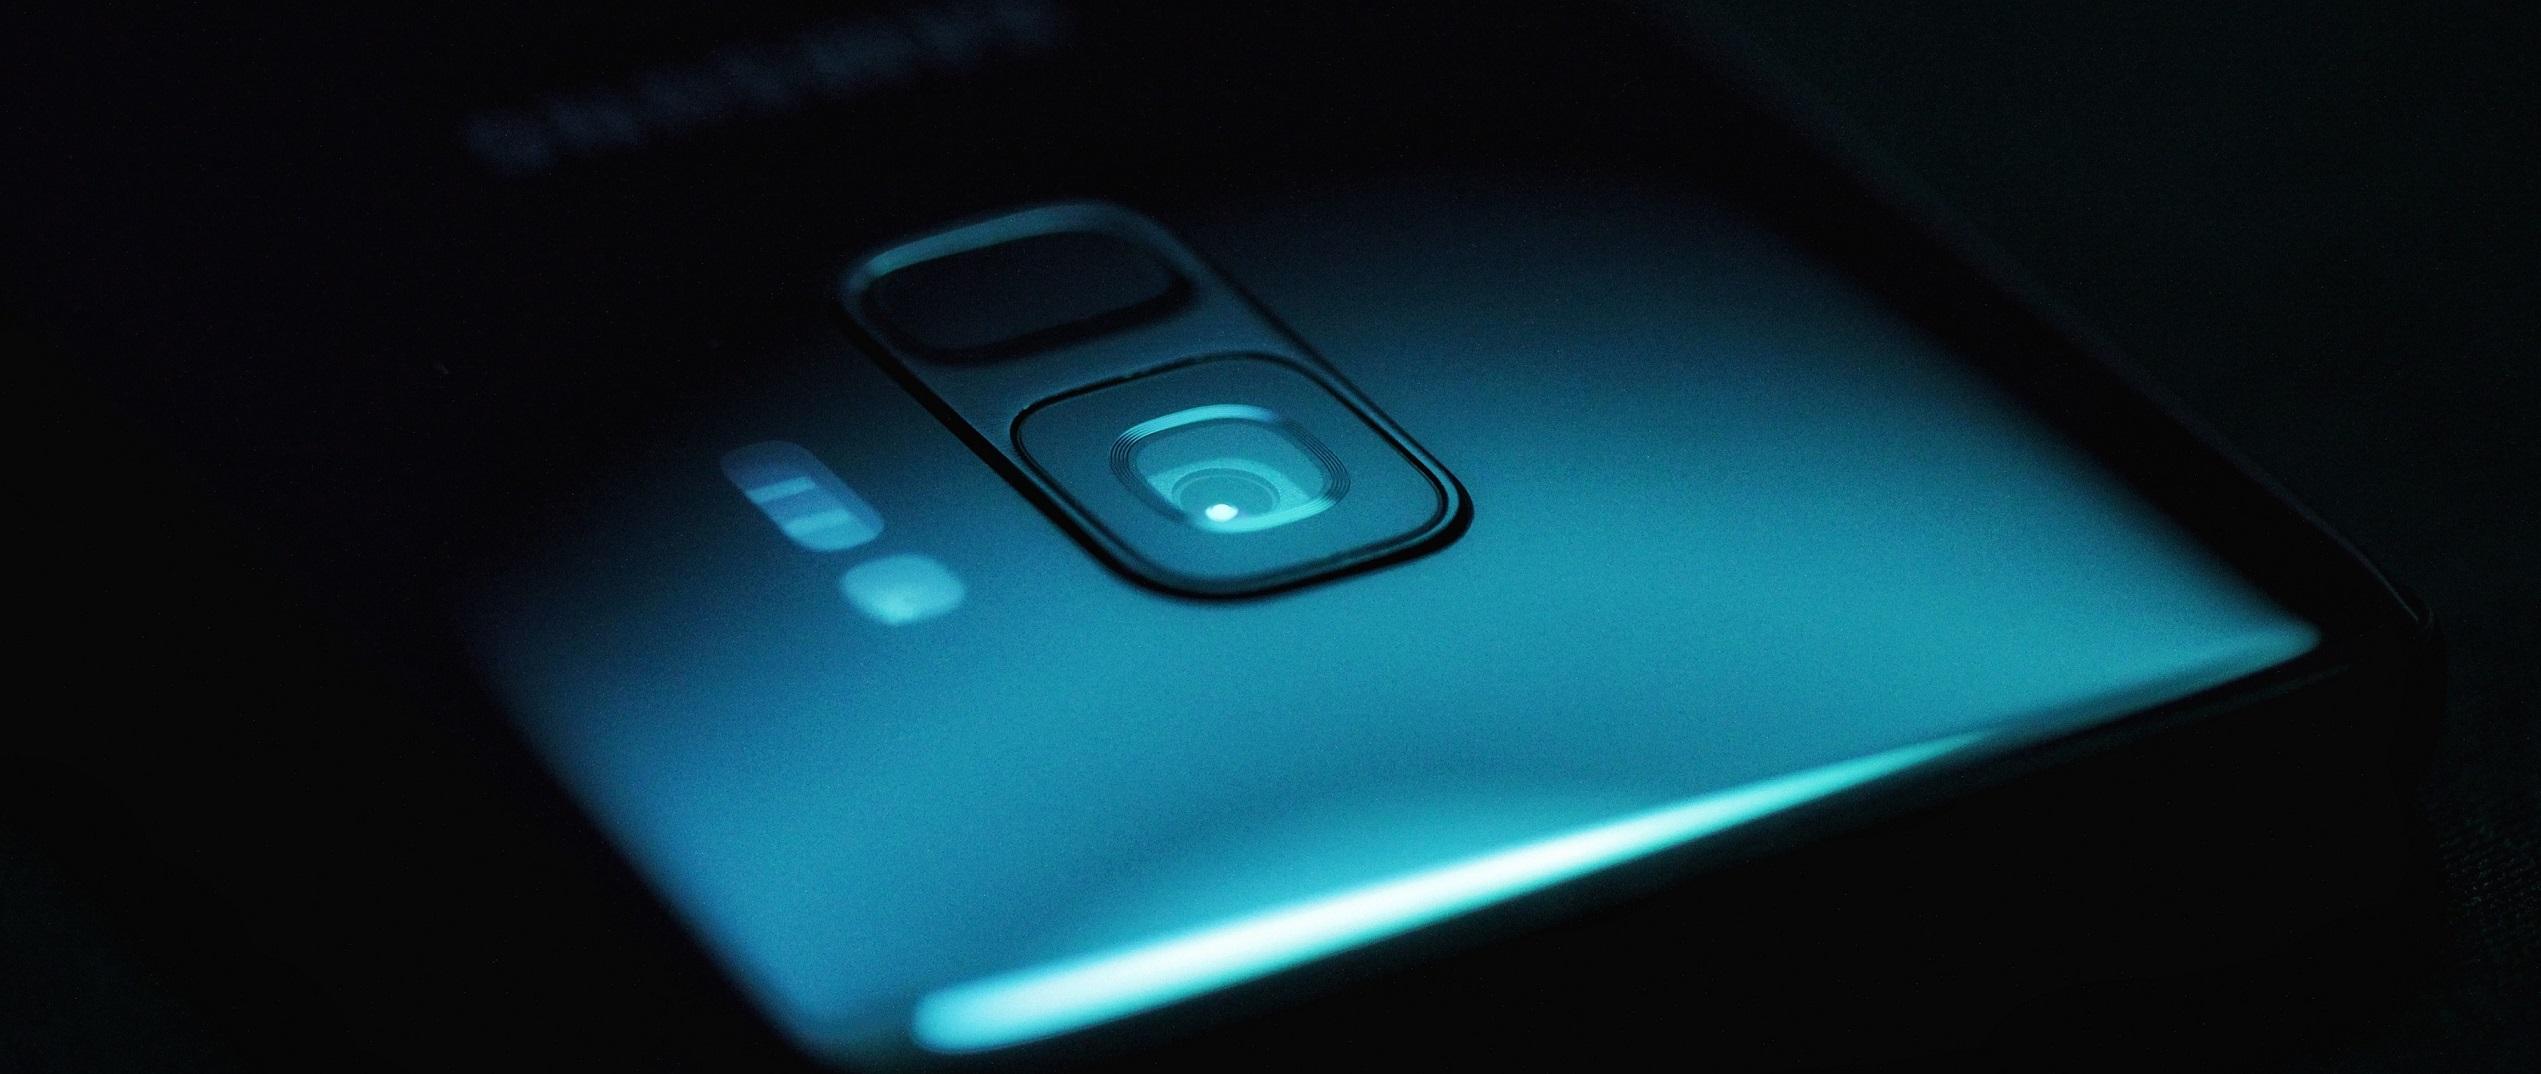 Ce noutati aduce Samsung prin Galaxy S10?